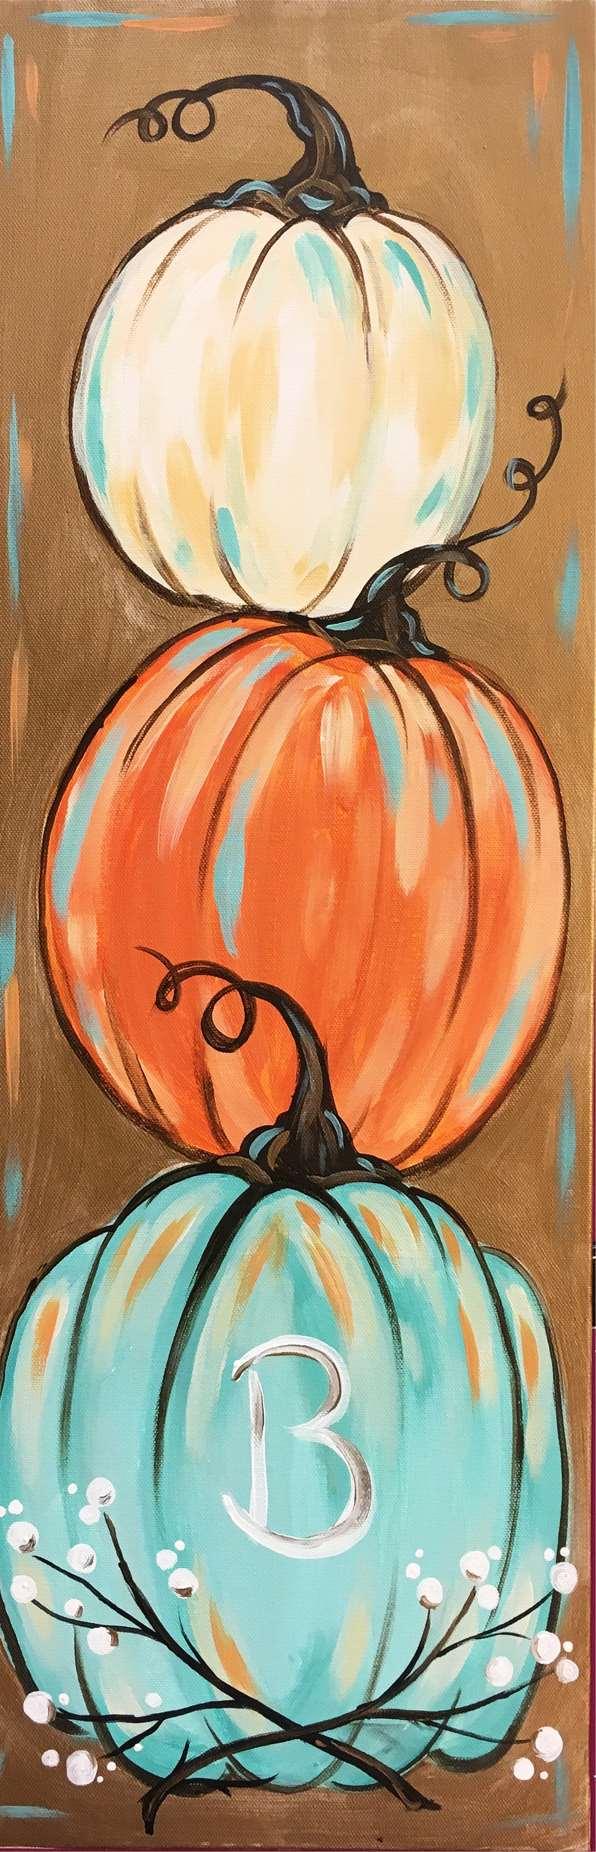 """Pleasantly Pumpkin""  10 x 30 canvas or wood!"